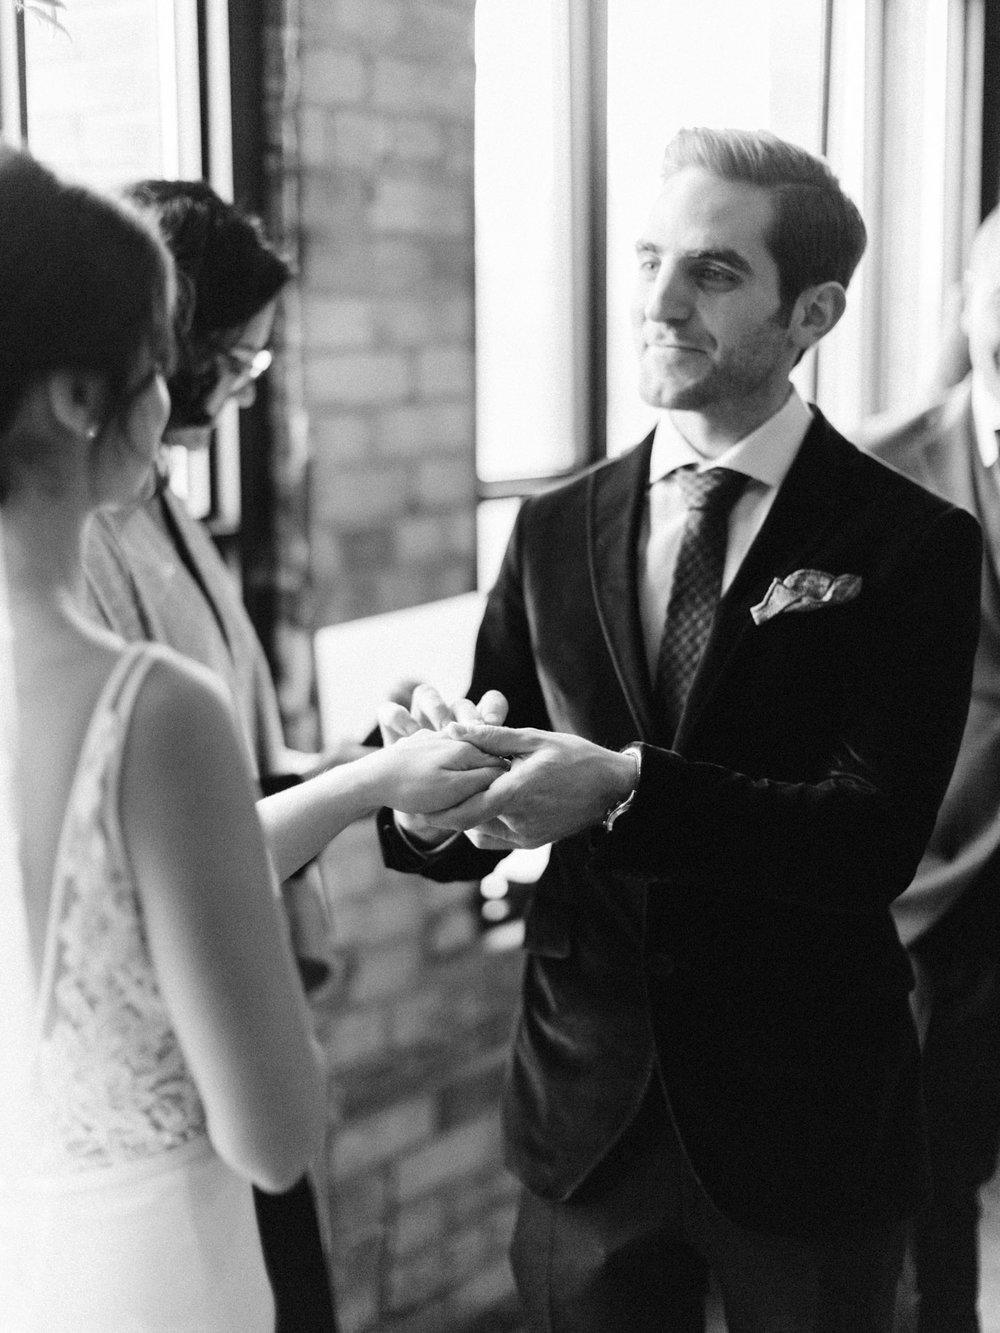 corynn-fowler-photography-toronto-collingwood-destination-wedding-photographer-481.jpg